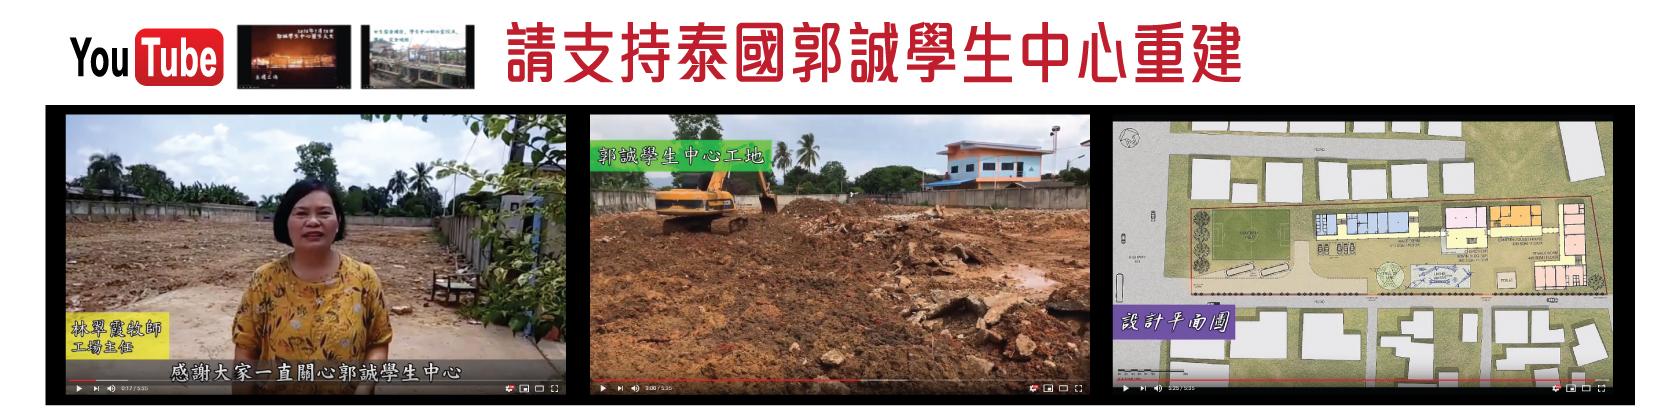 CB-02-web-banner-1680-x-420-04-3